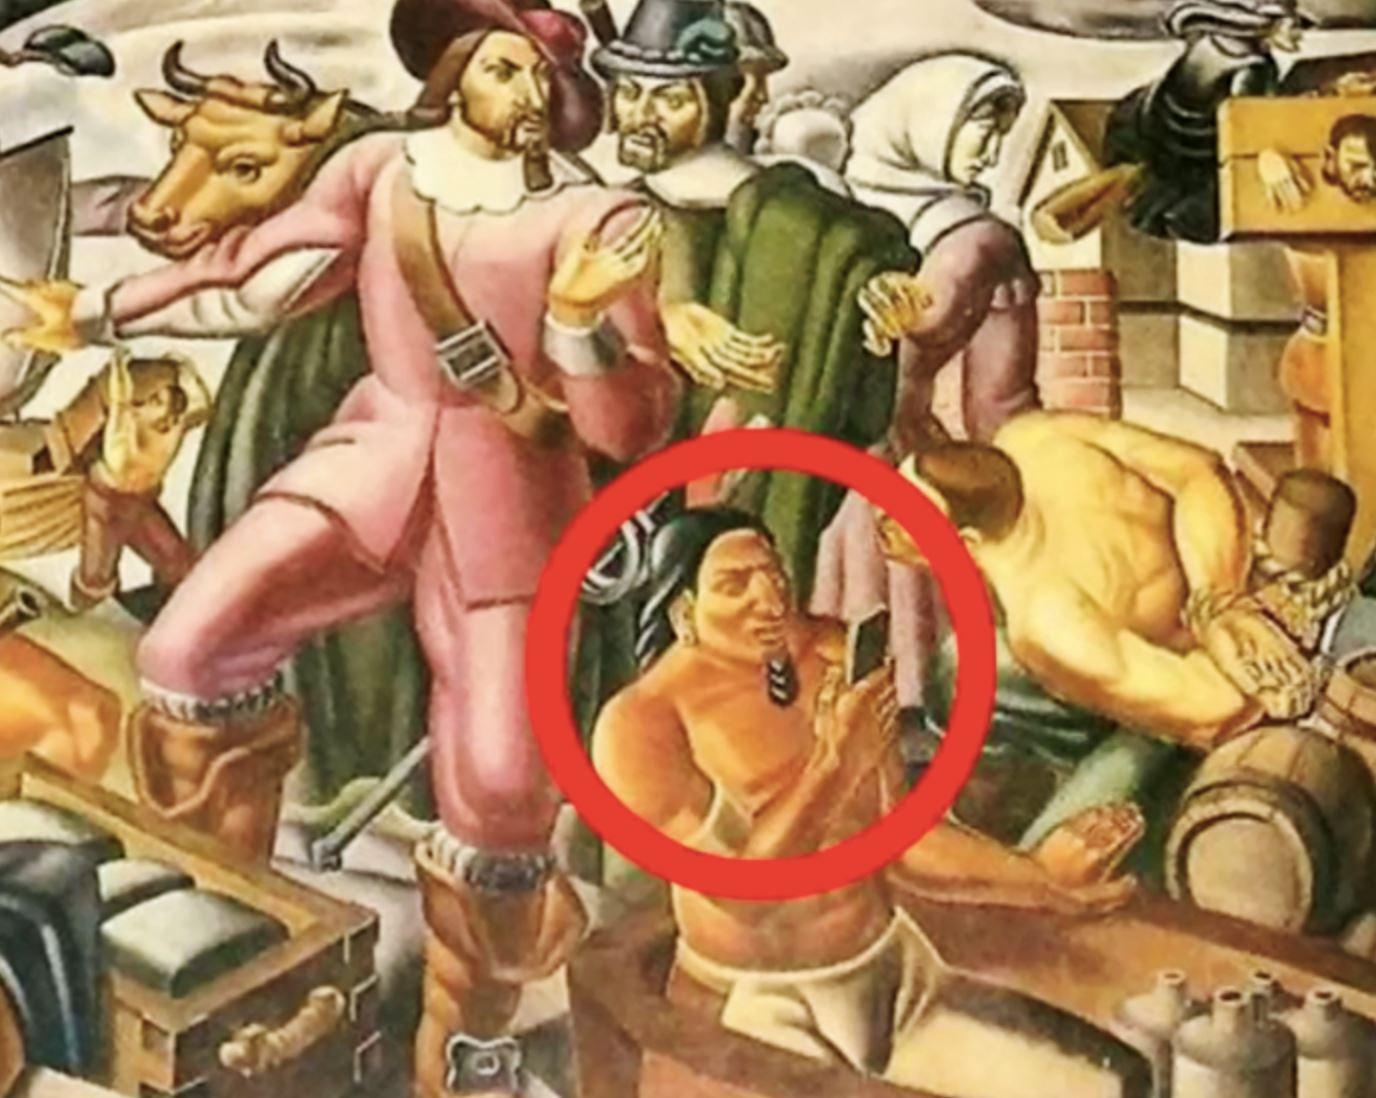 lelaki pegang smartphone dalam lukisan 400 tahun lalu timbul tanda tanya